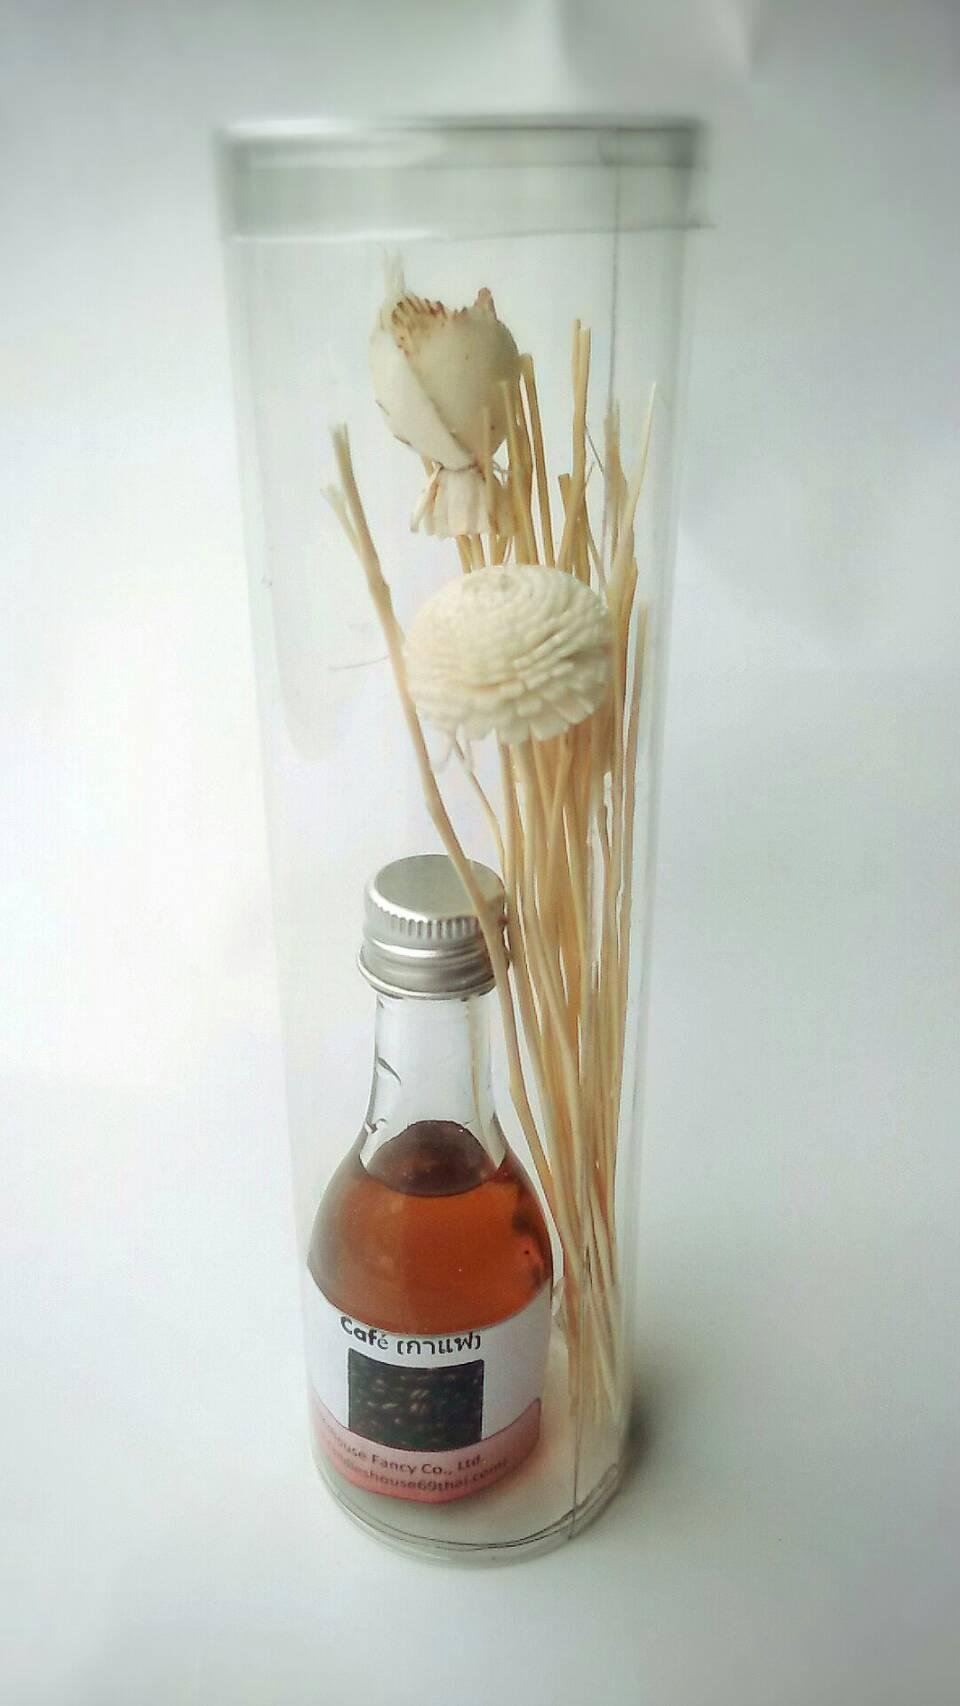 Gift set ชุดน้ำมันหอมระเหยเข้มข้น กลิ่นกาแฟ ขนาด 30 ml.